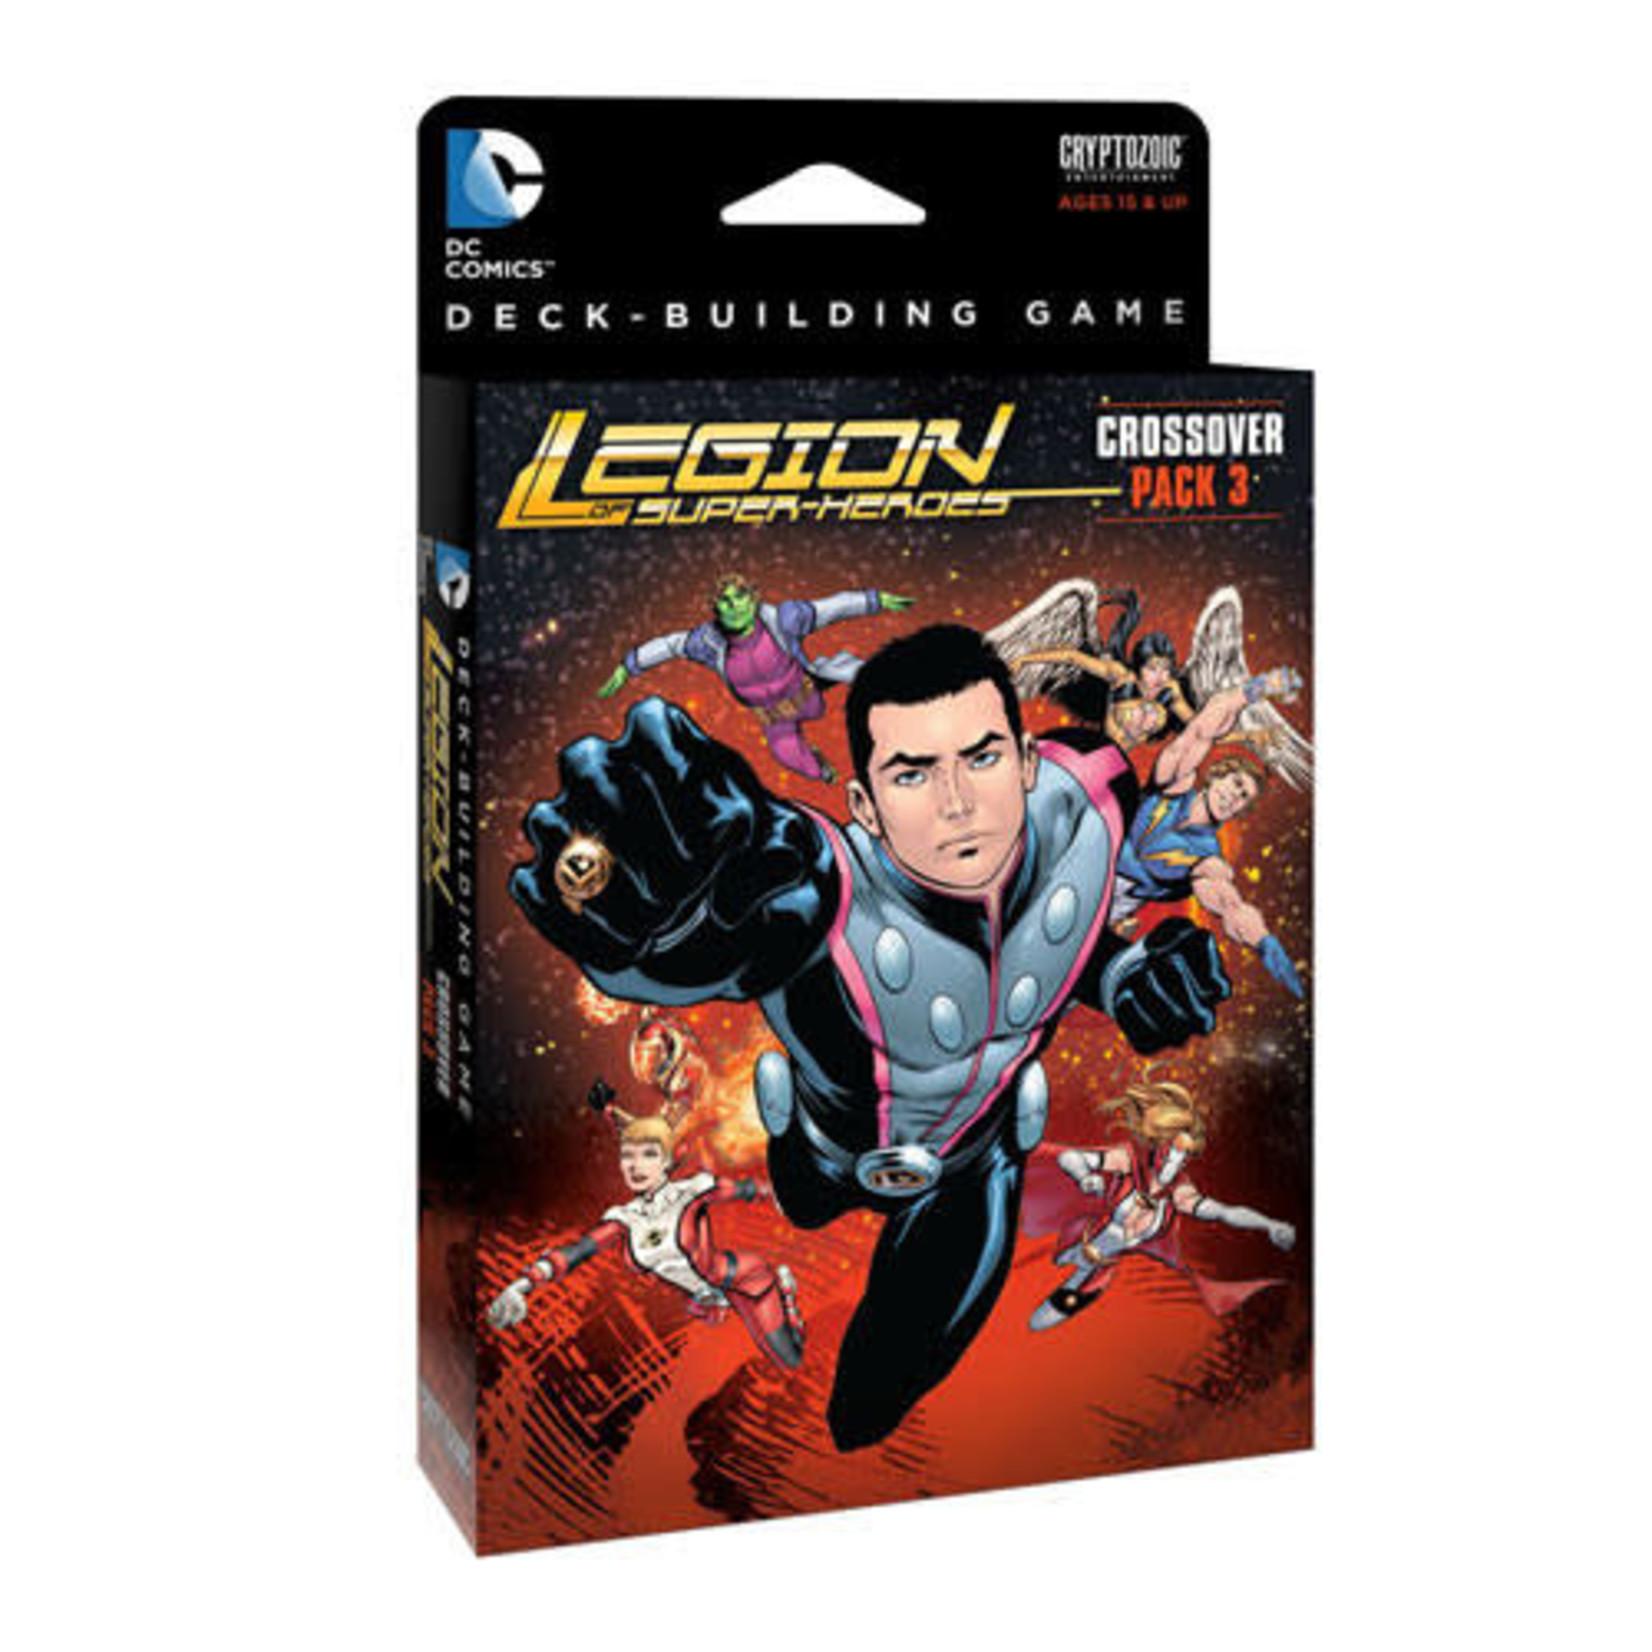 DC Comics Crossover Pack 3 Legion